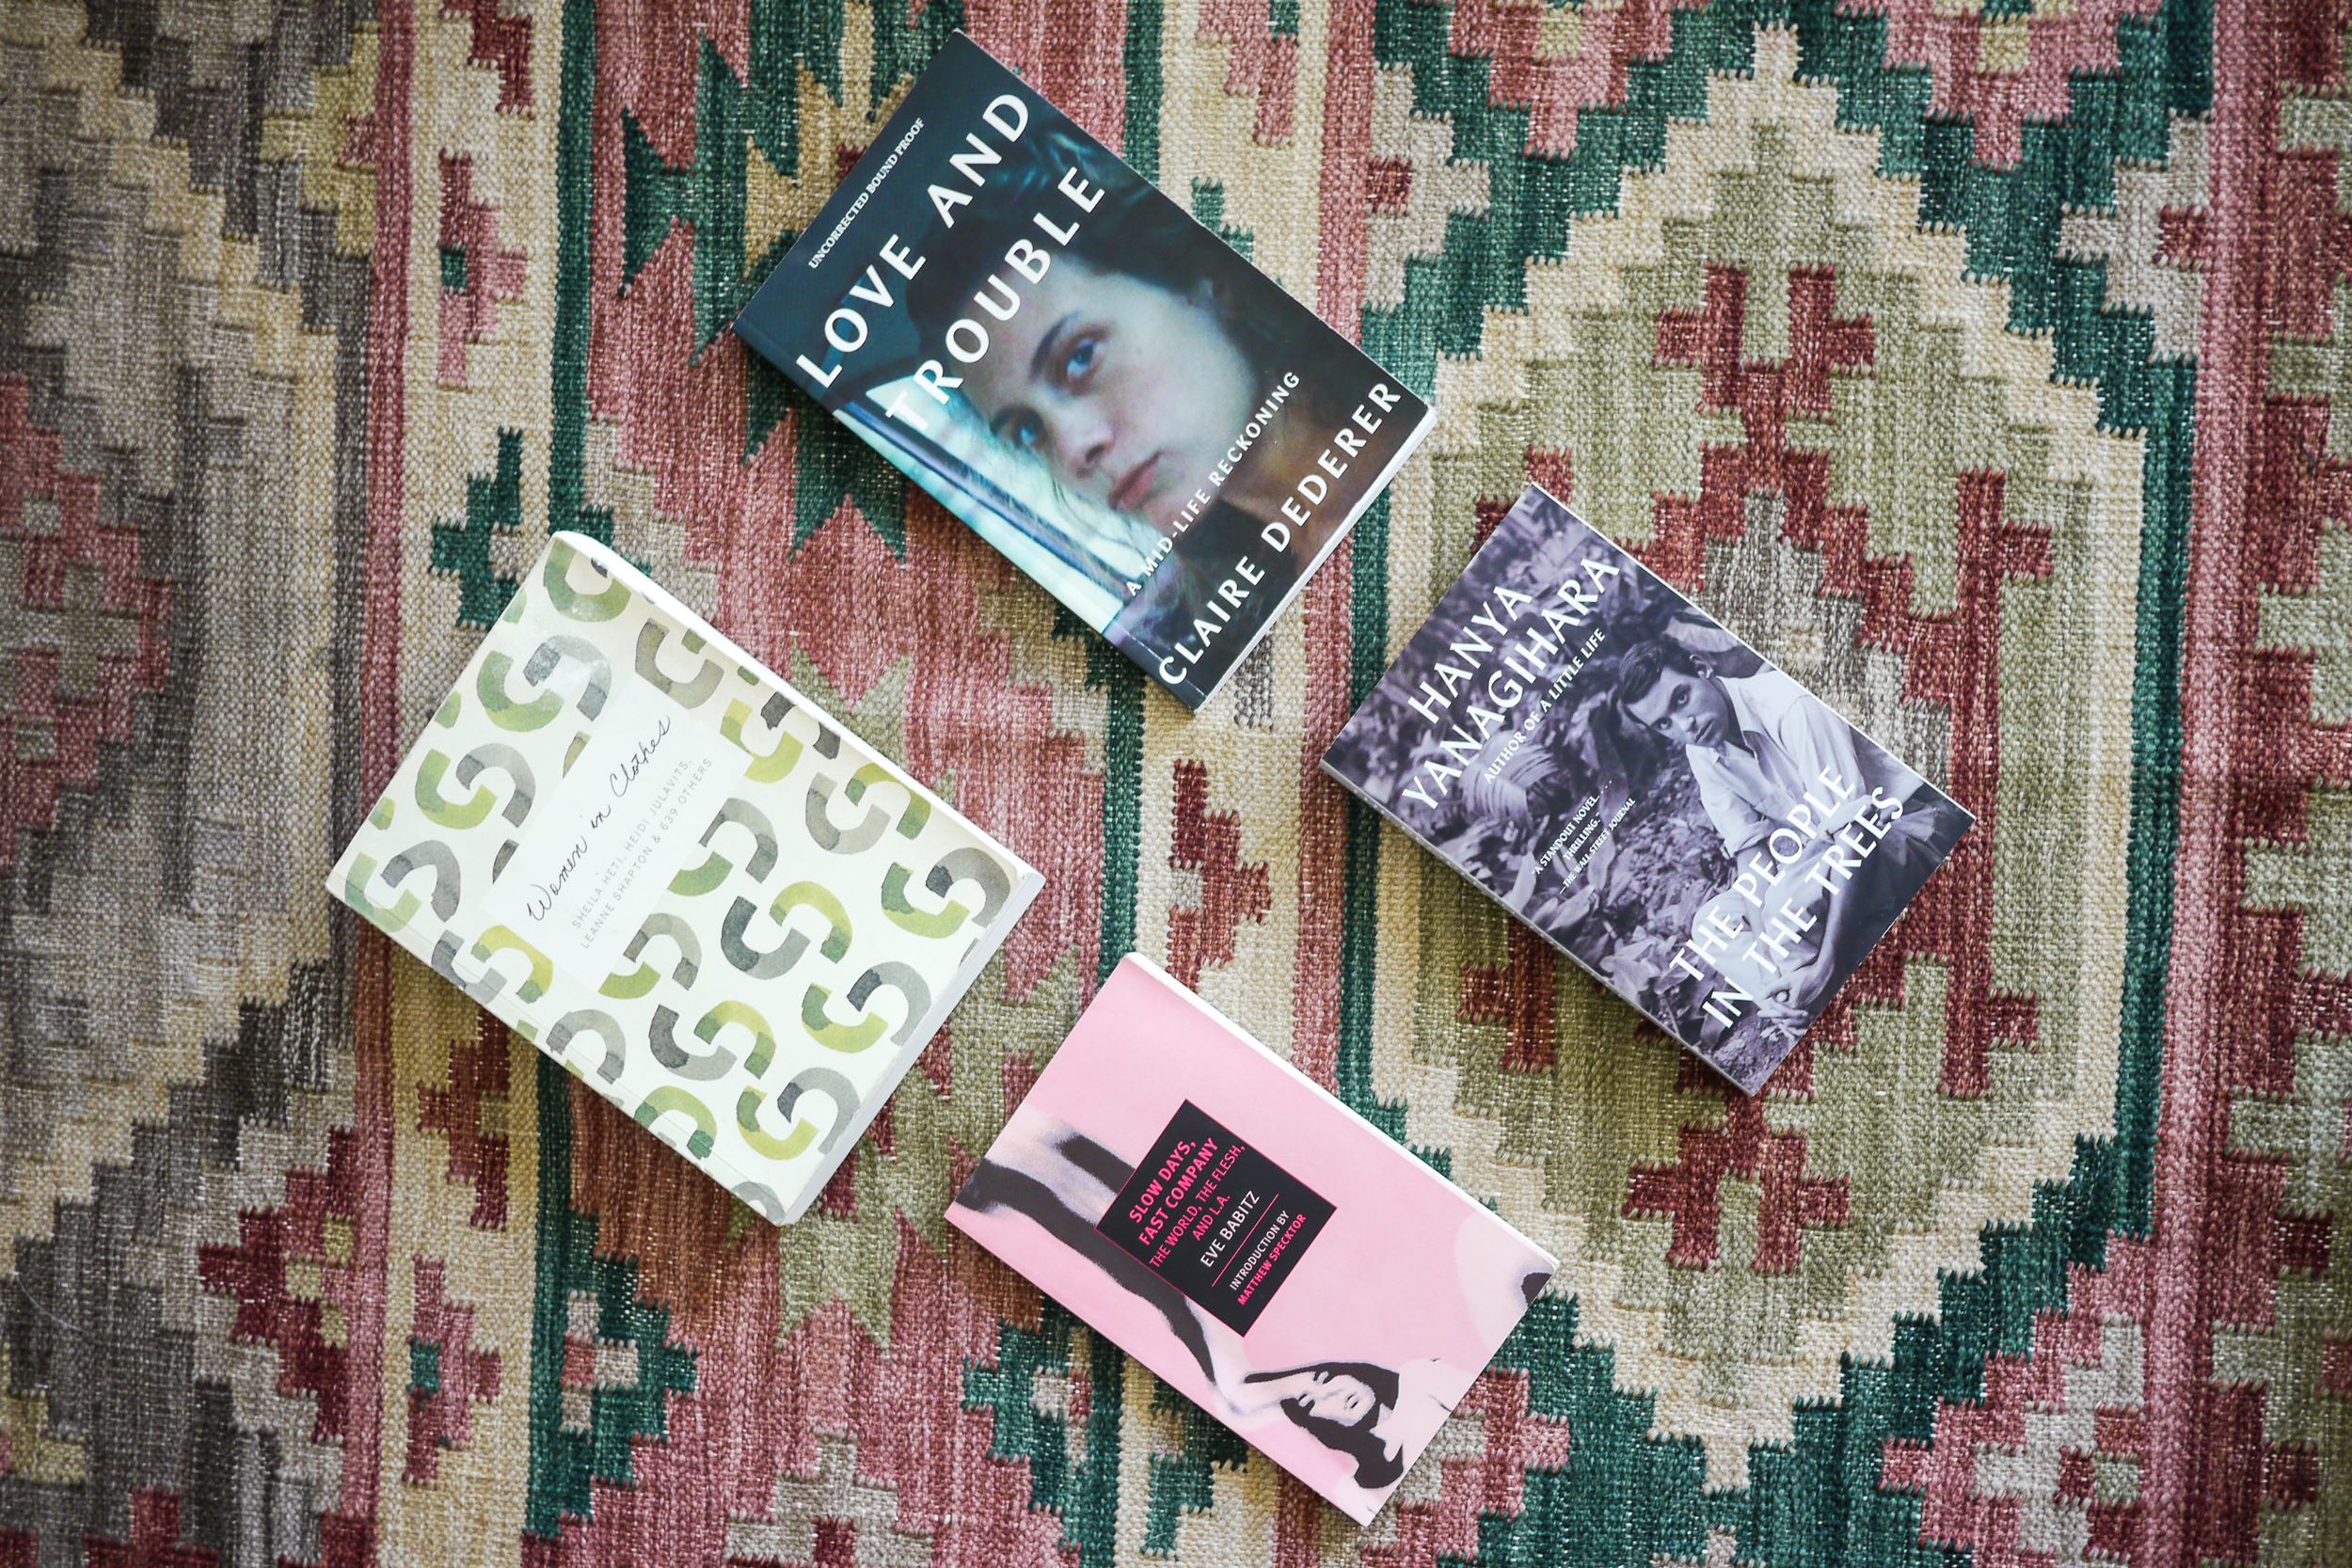 Angie's favorite books